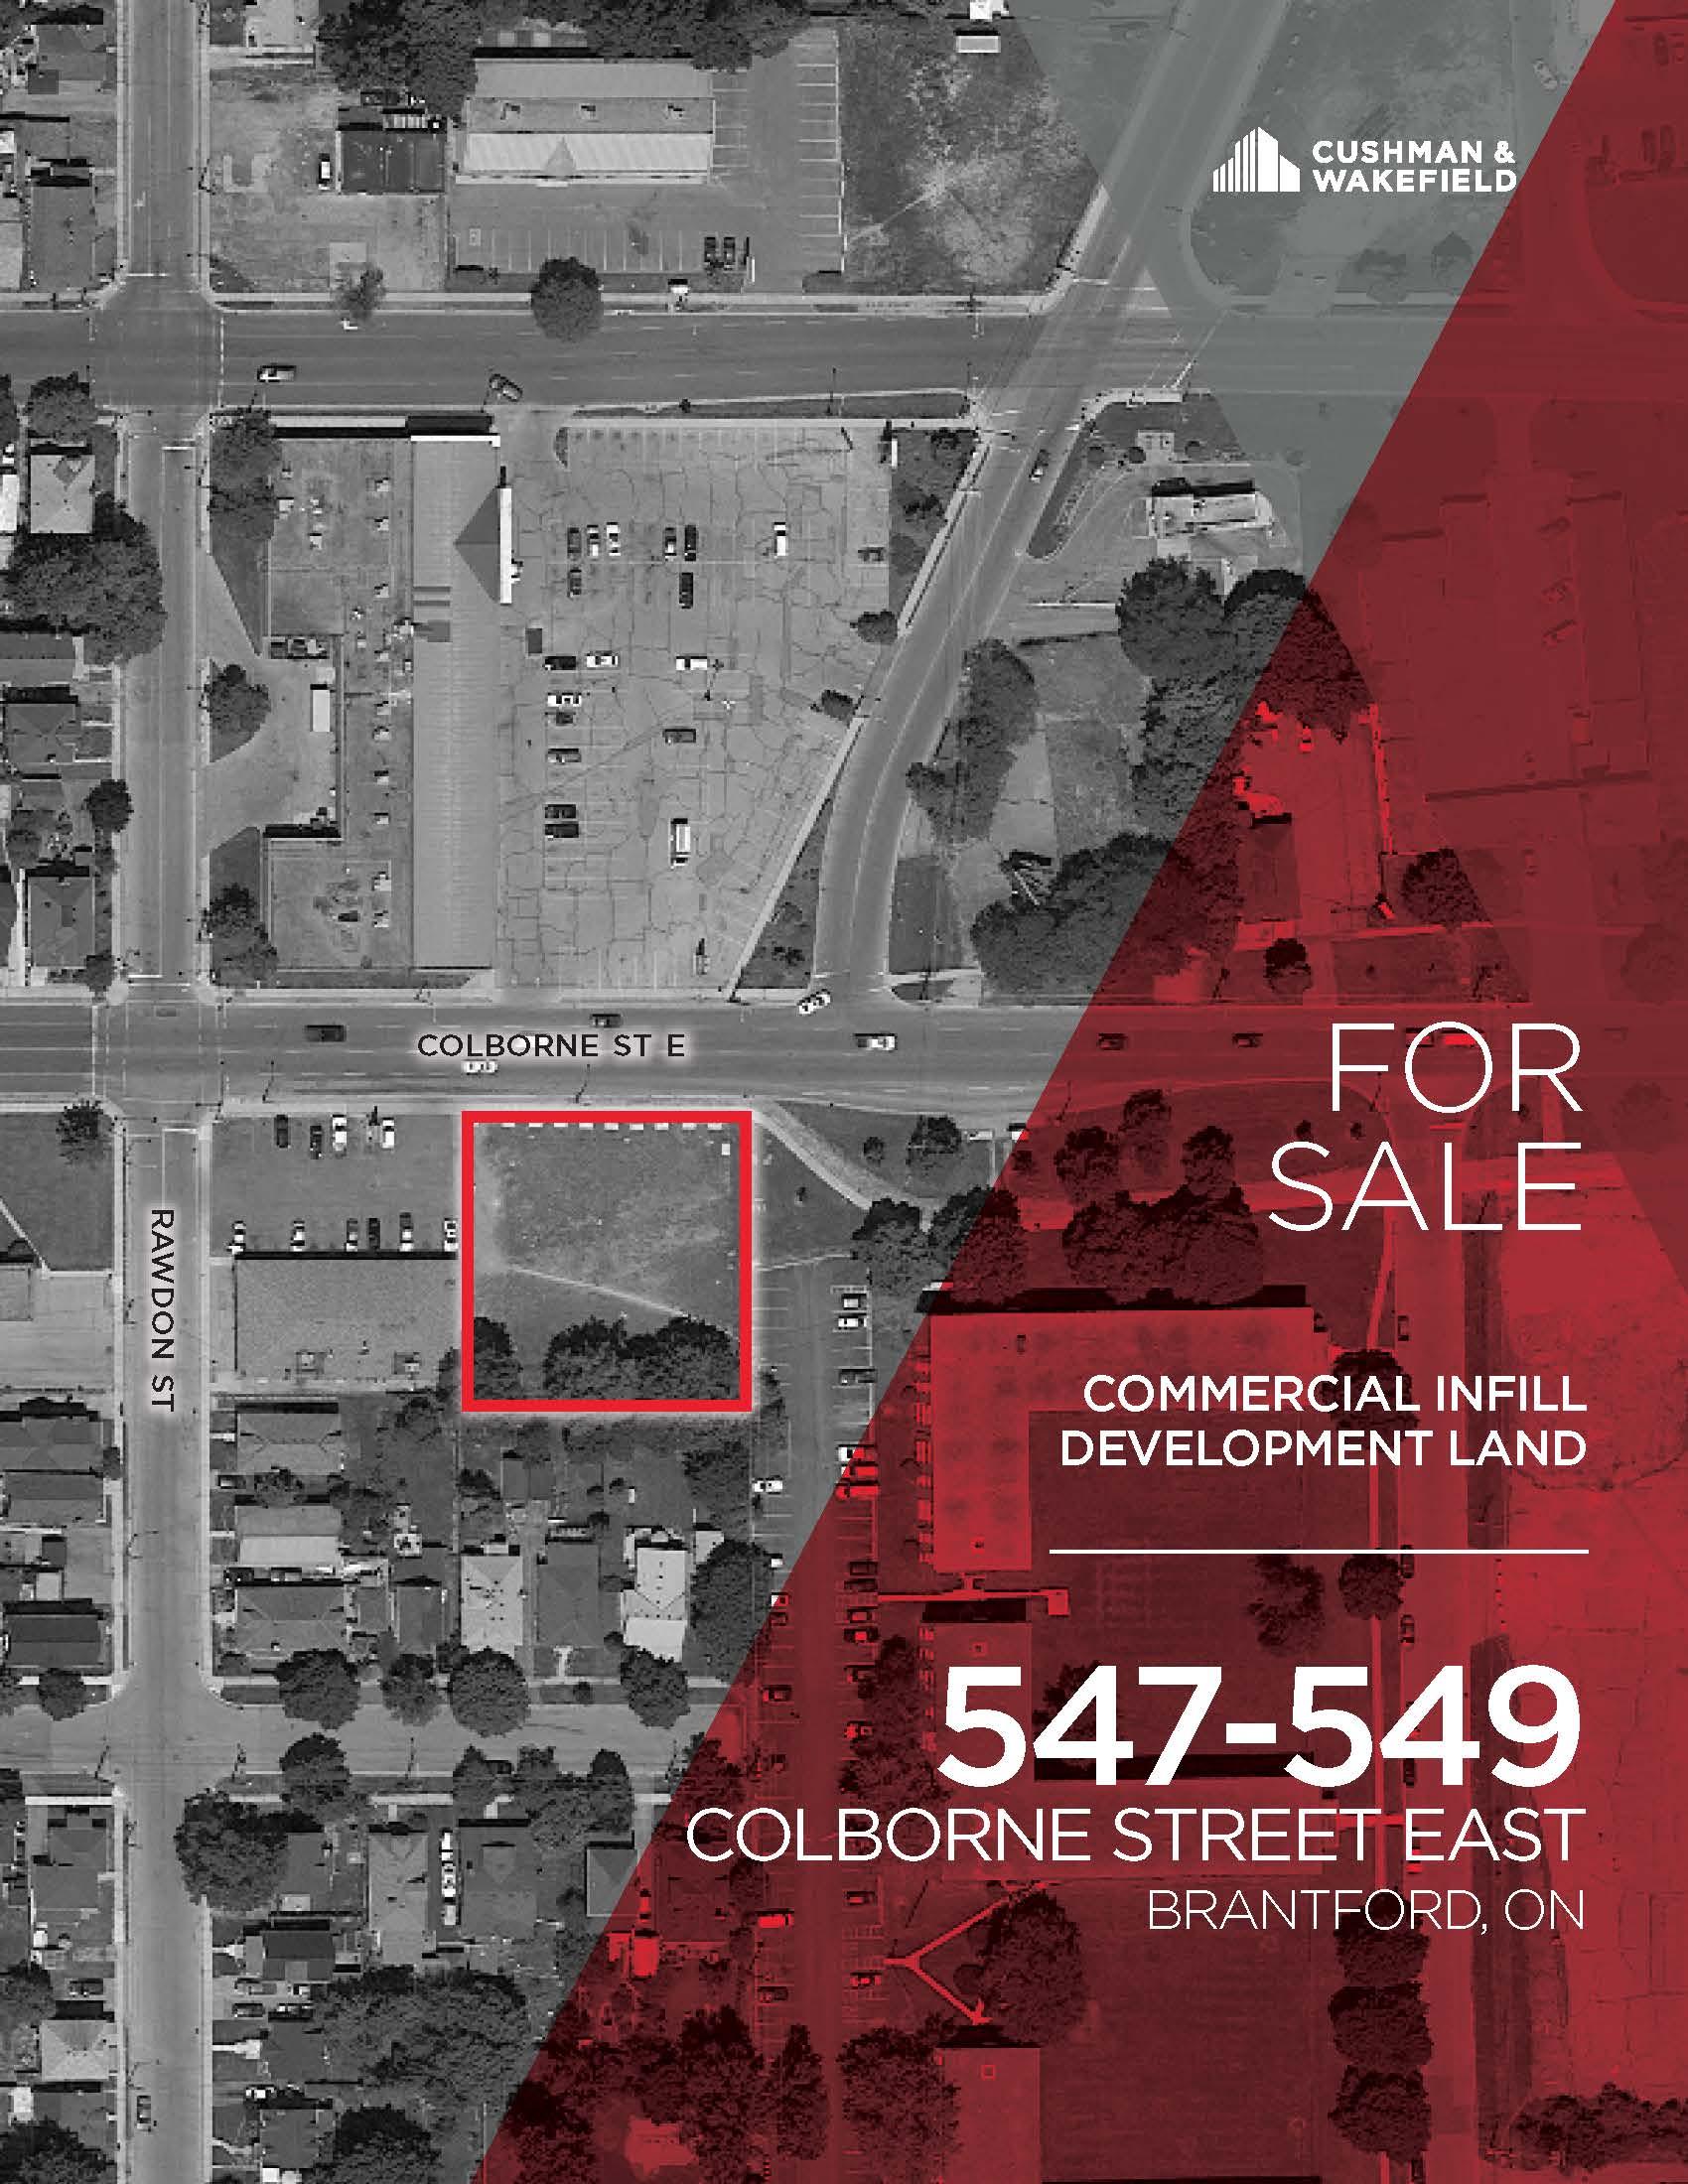 547-549 Colborne Street East, Brantford | Commercial Infill Development Land for Sale